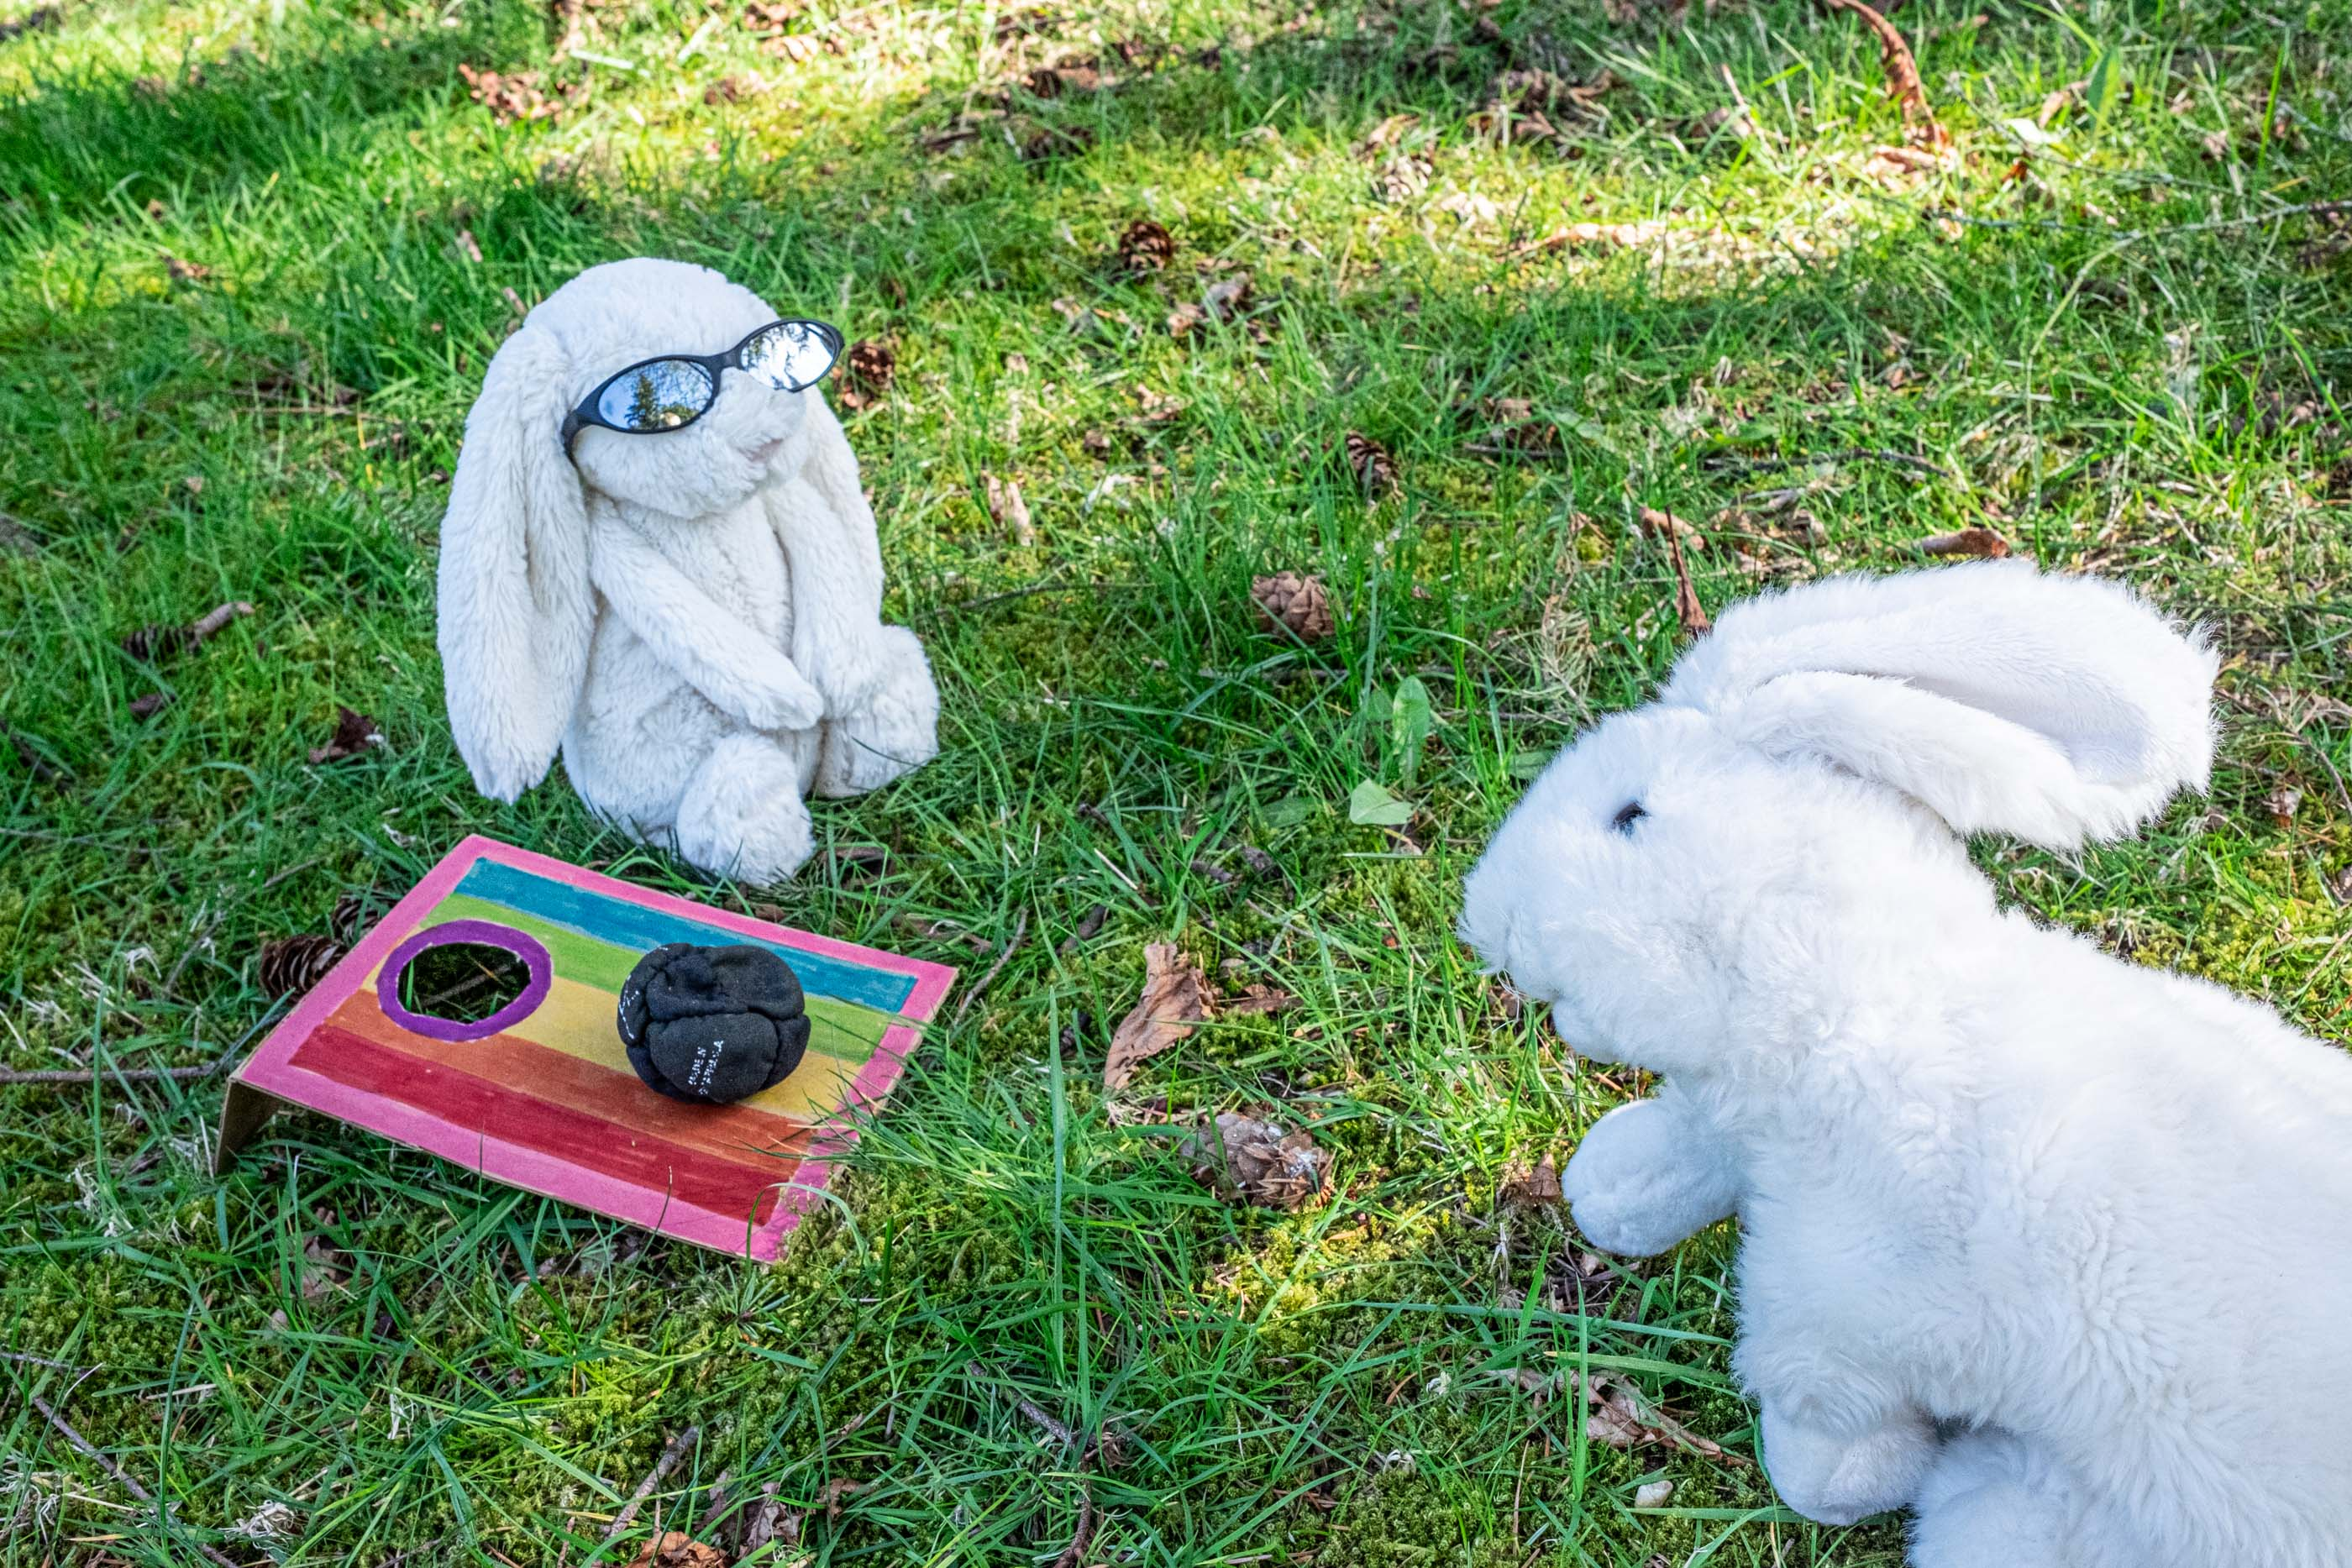 bunnies playing cornhole